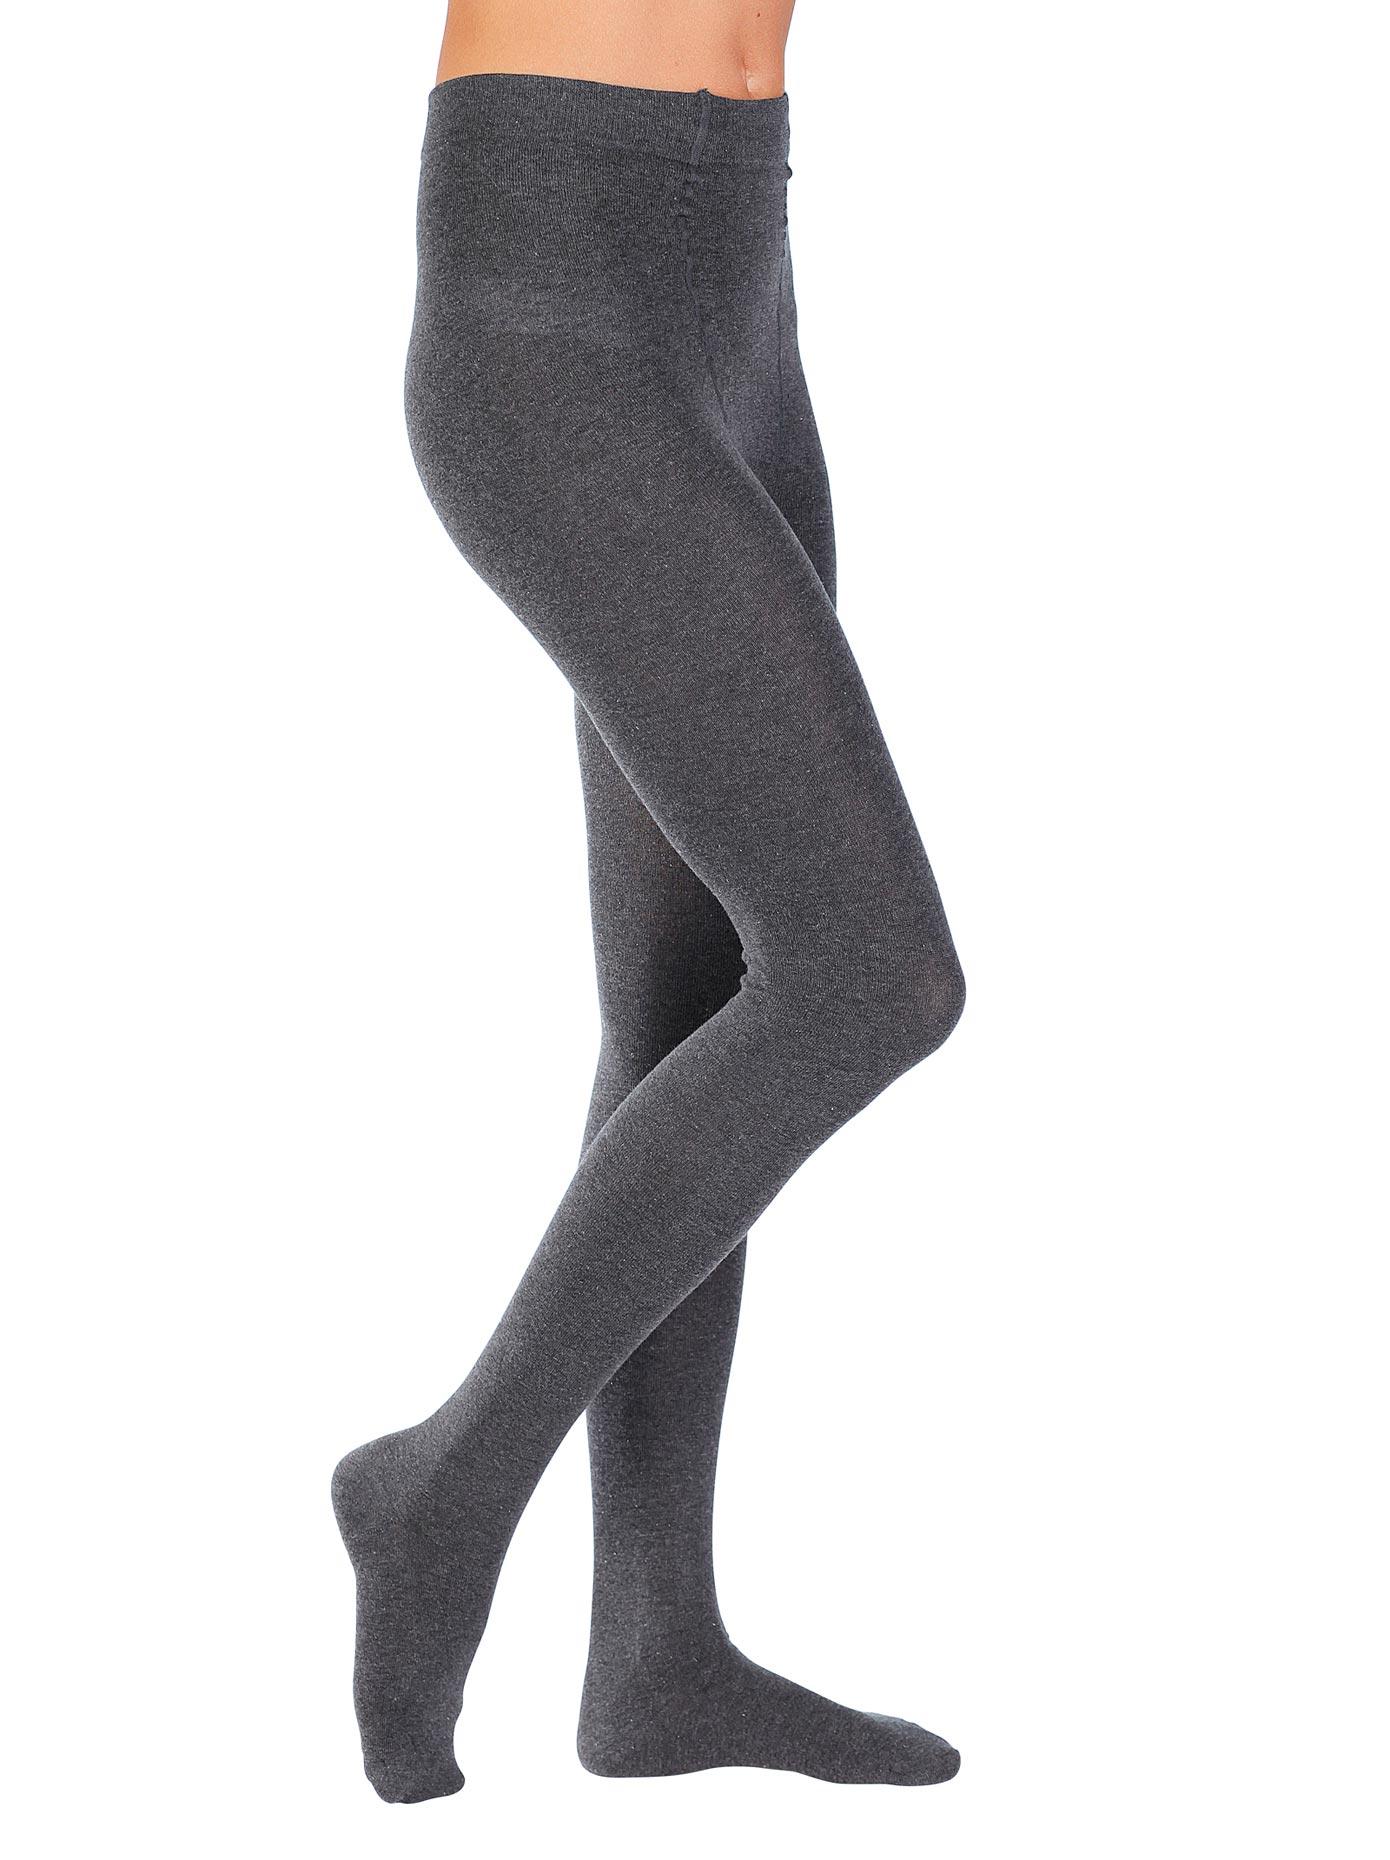 Hudson Strickstrumpfhose grau Damen Strickstrumpfhosen Strumpfhosen Damenwäsche